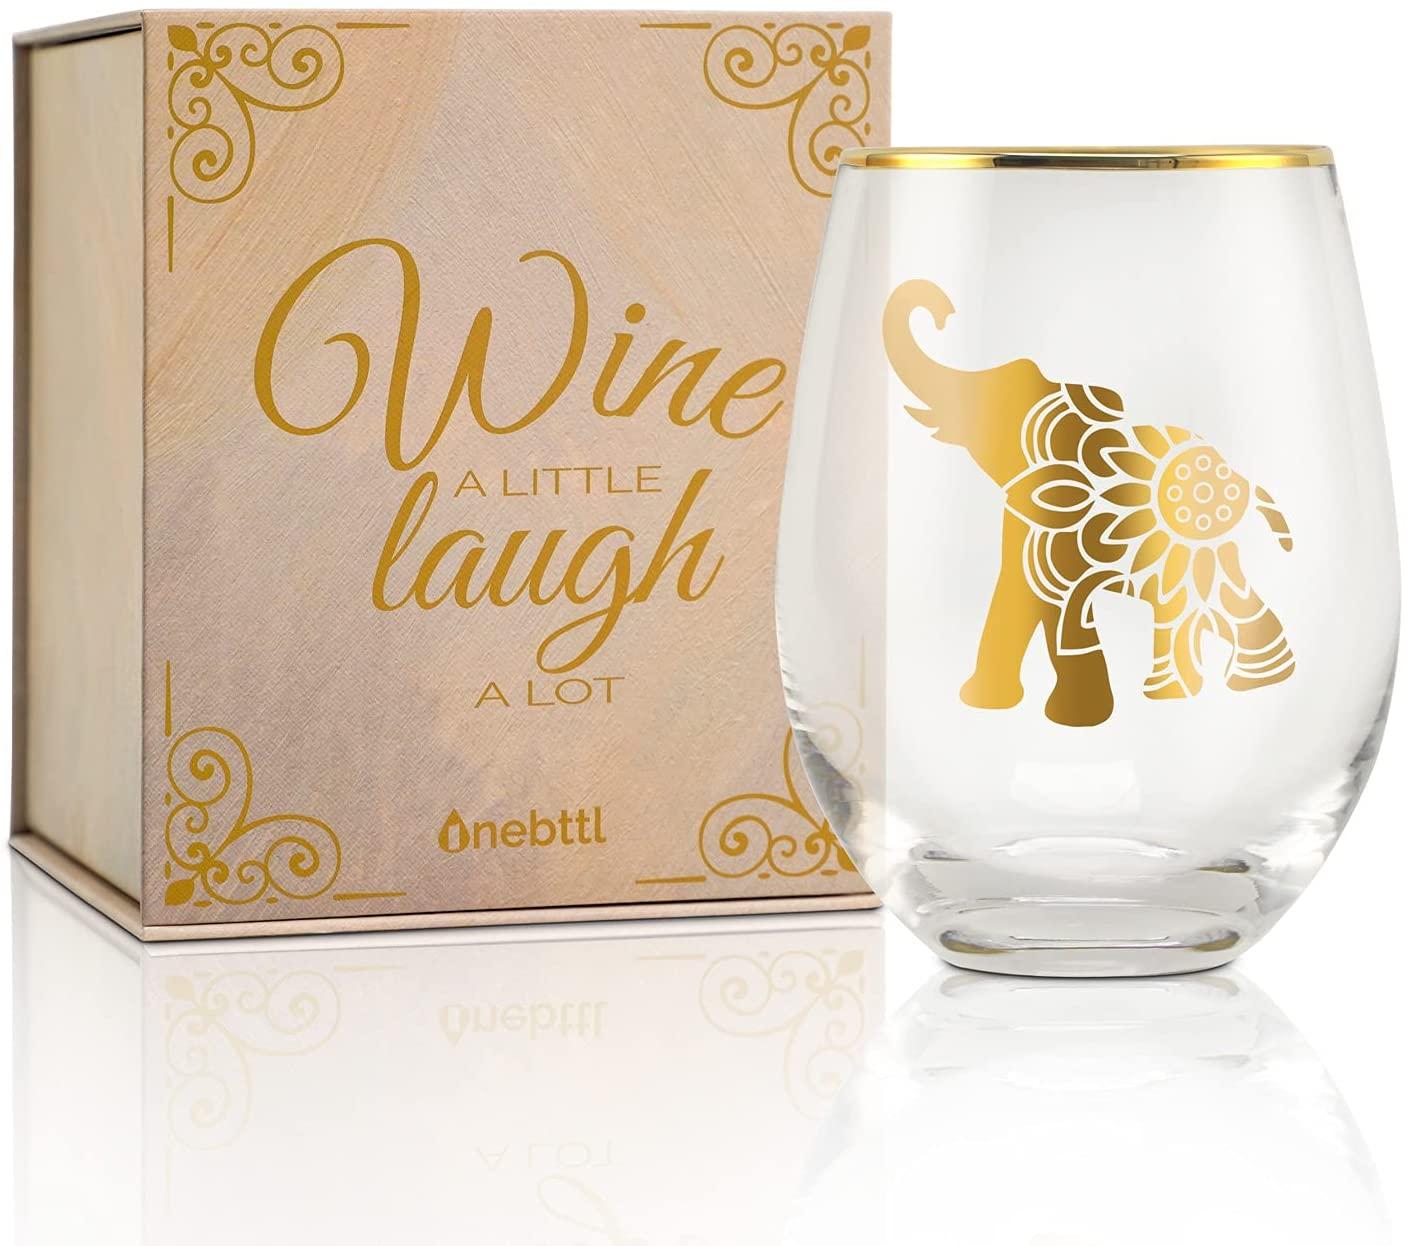 elephant-gifts-wine-glass